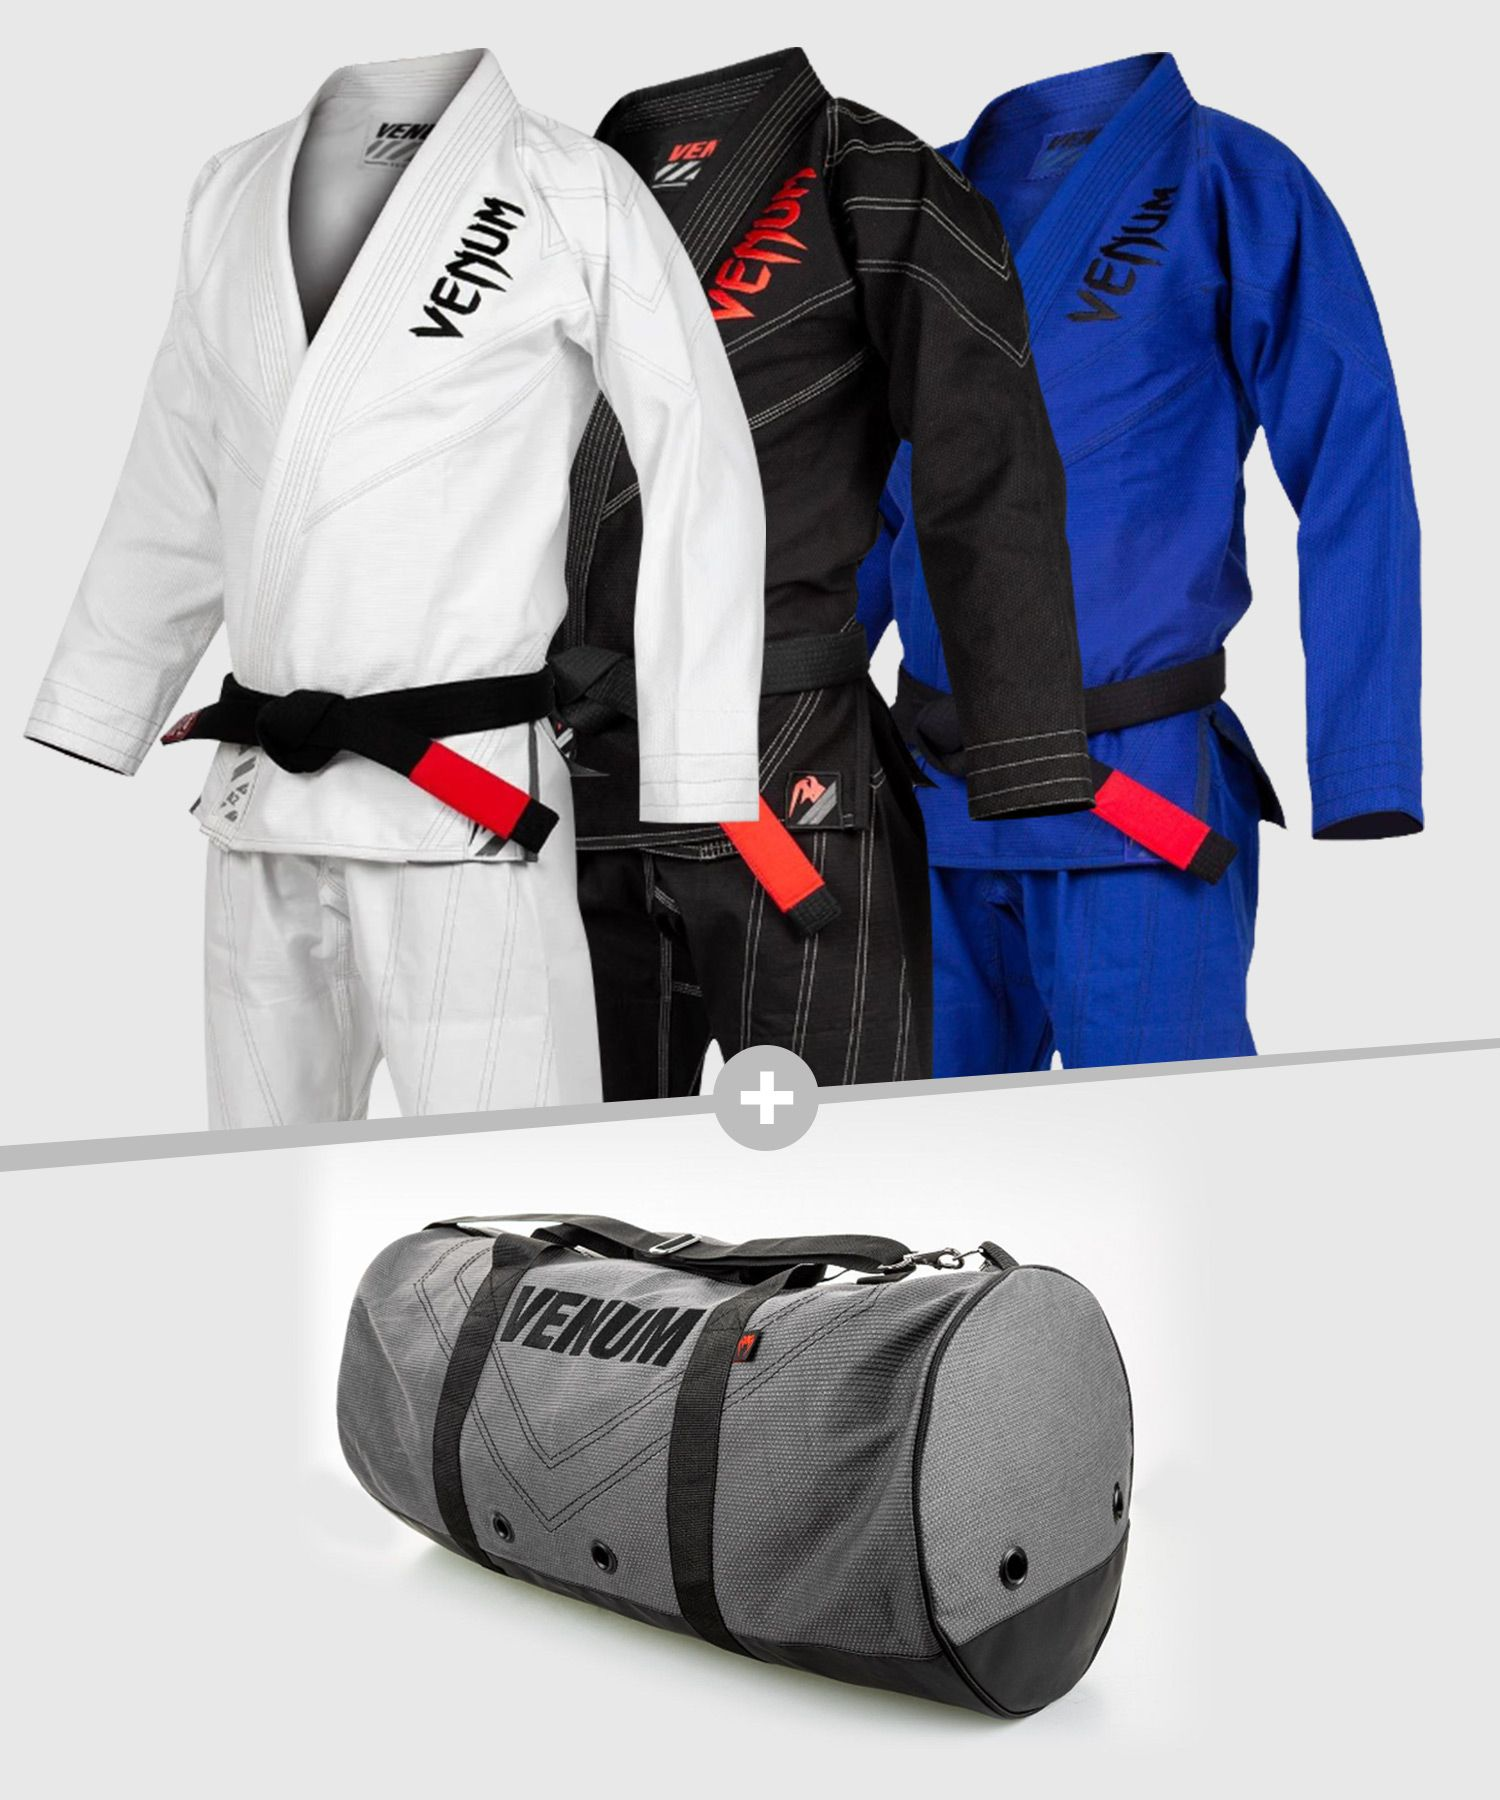 Venum Pack BJJ GI Power 2.0 + Rio Sports Bag